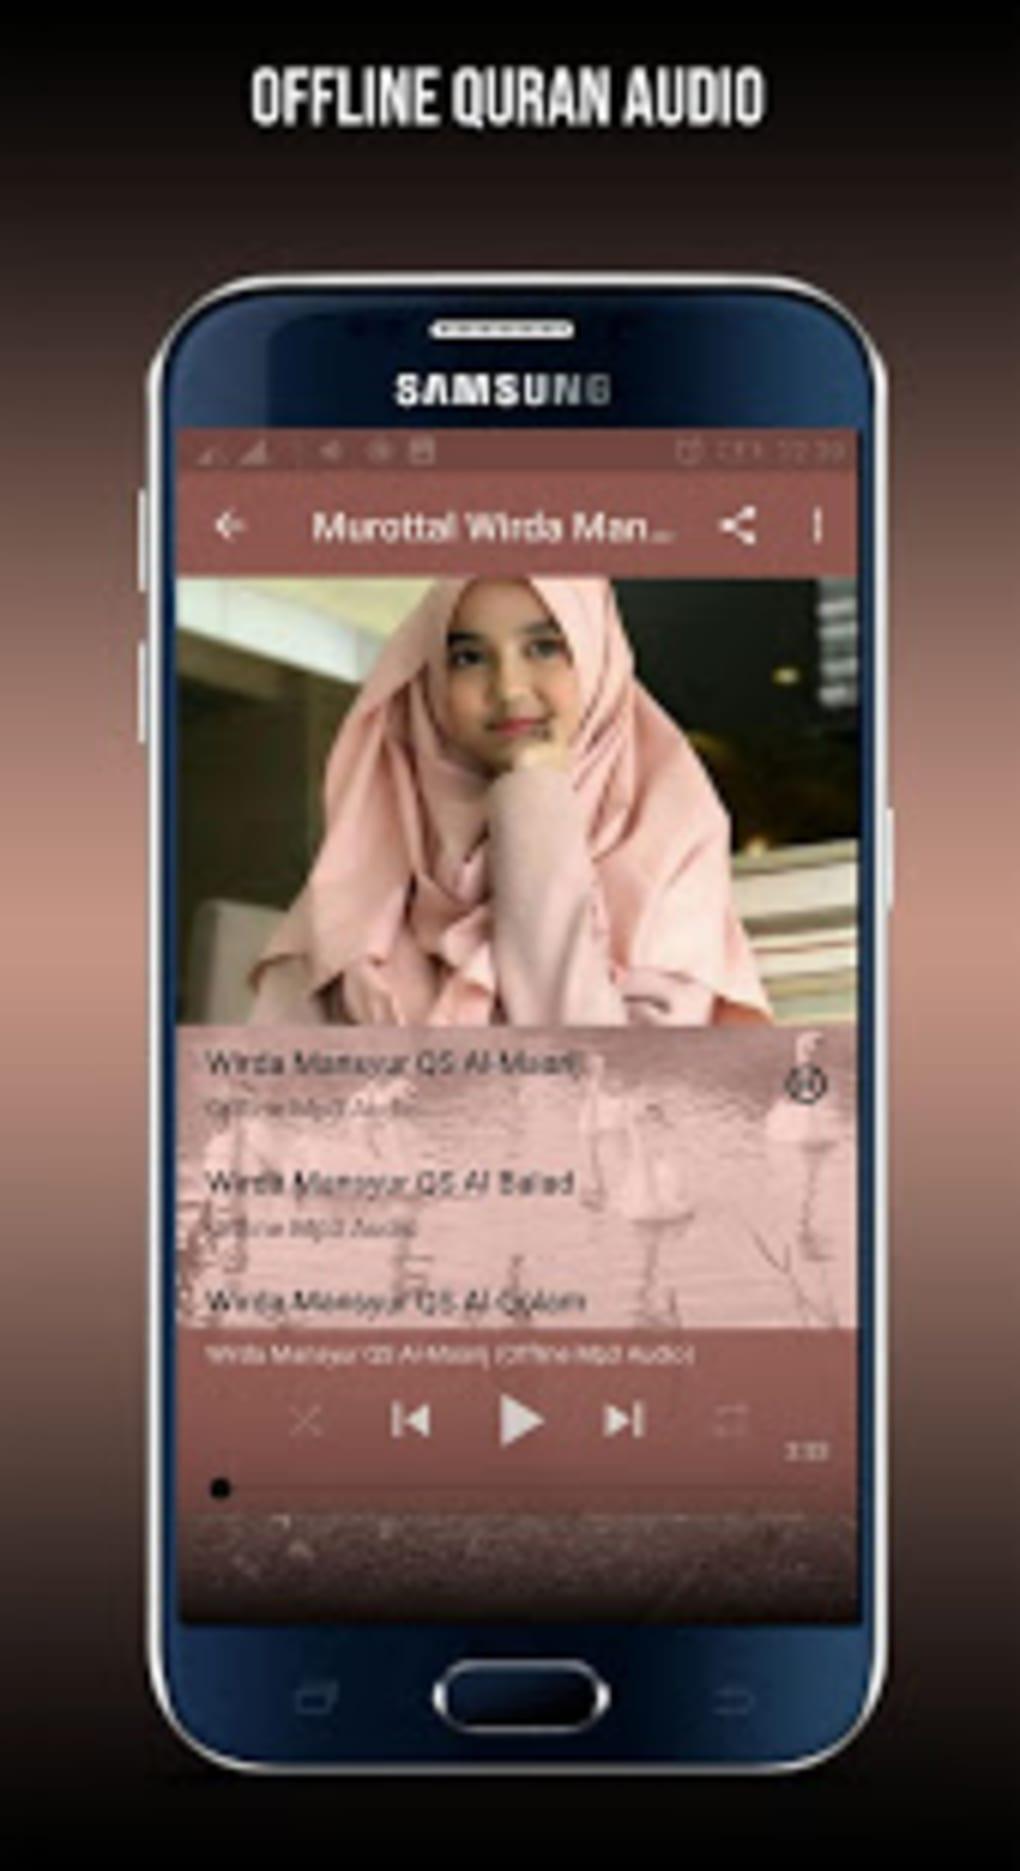 Murottal fatih seferagic quran mp3 for android apk download.